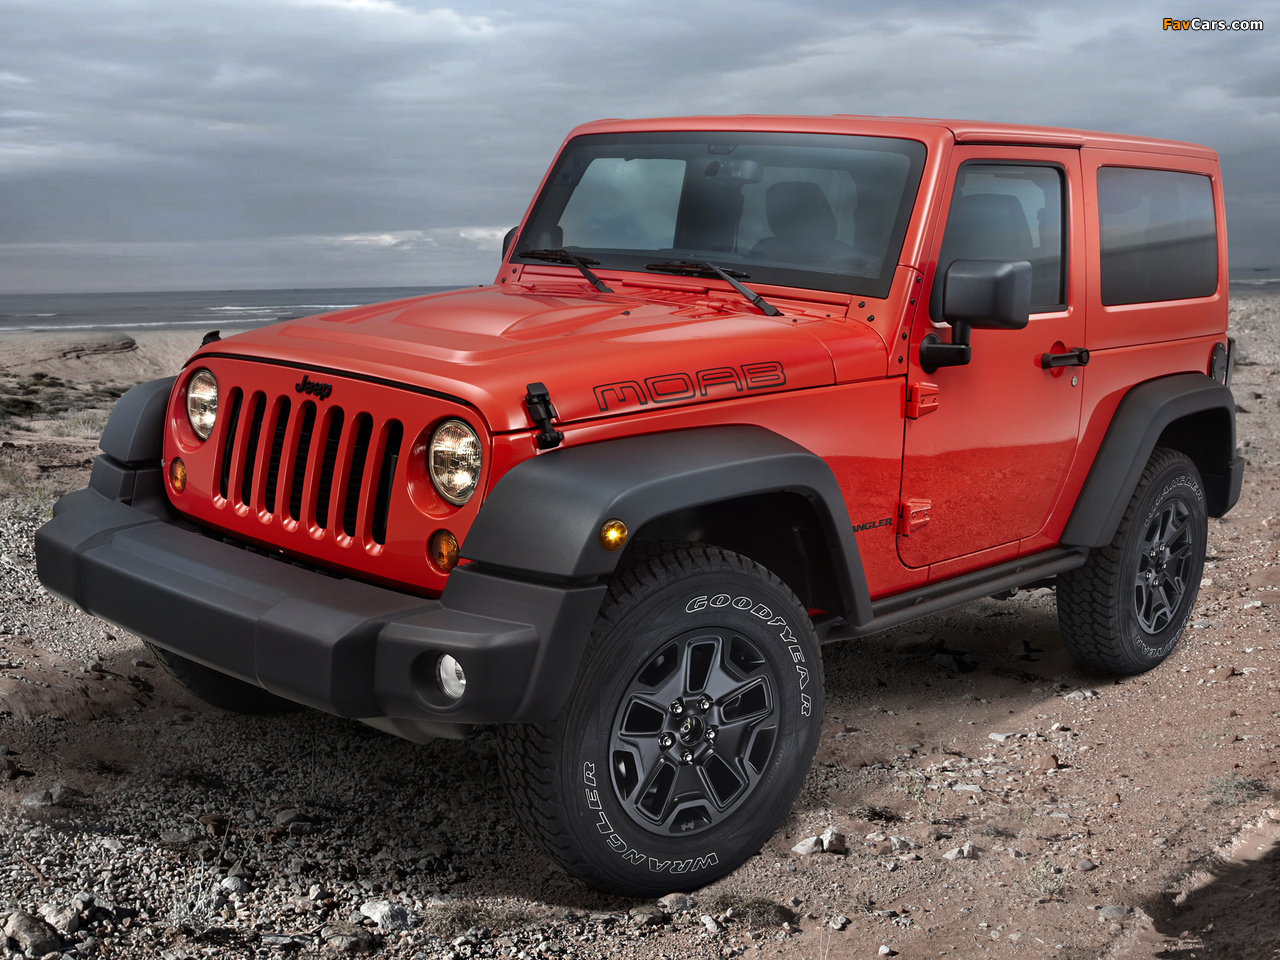 Jeep Wrangler Moab (JK) 2012 photos (1280 x 960)